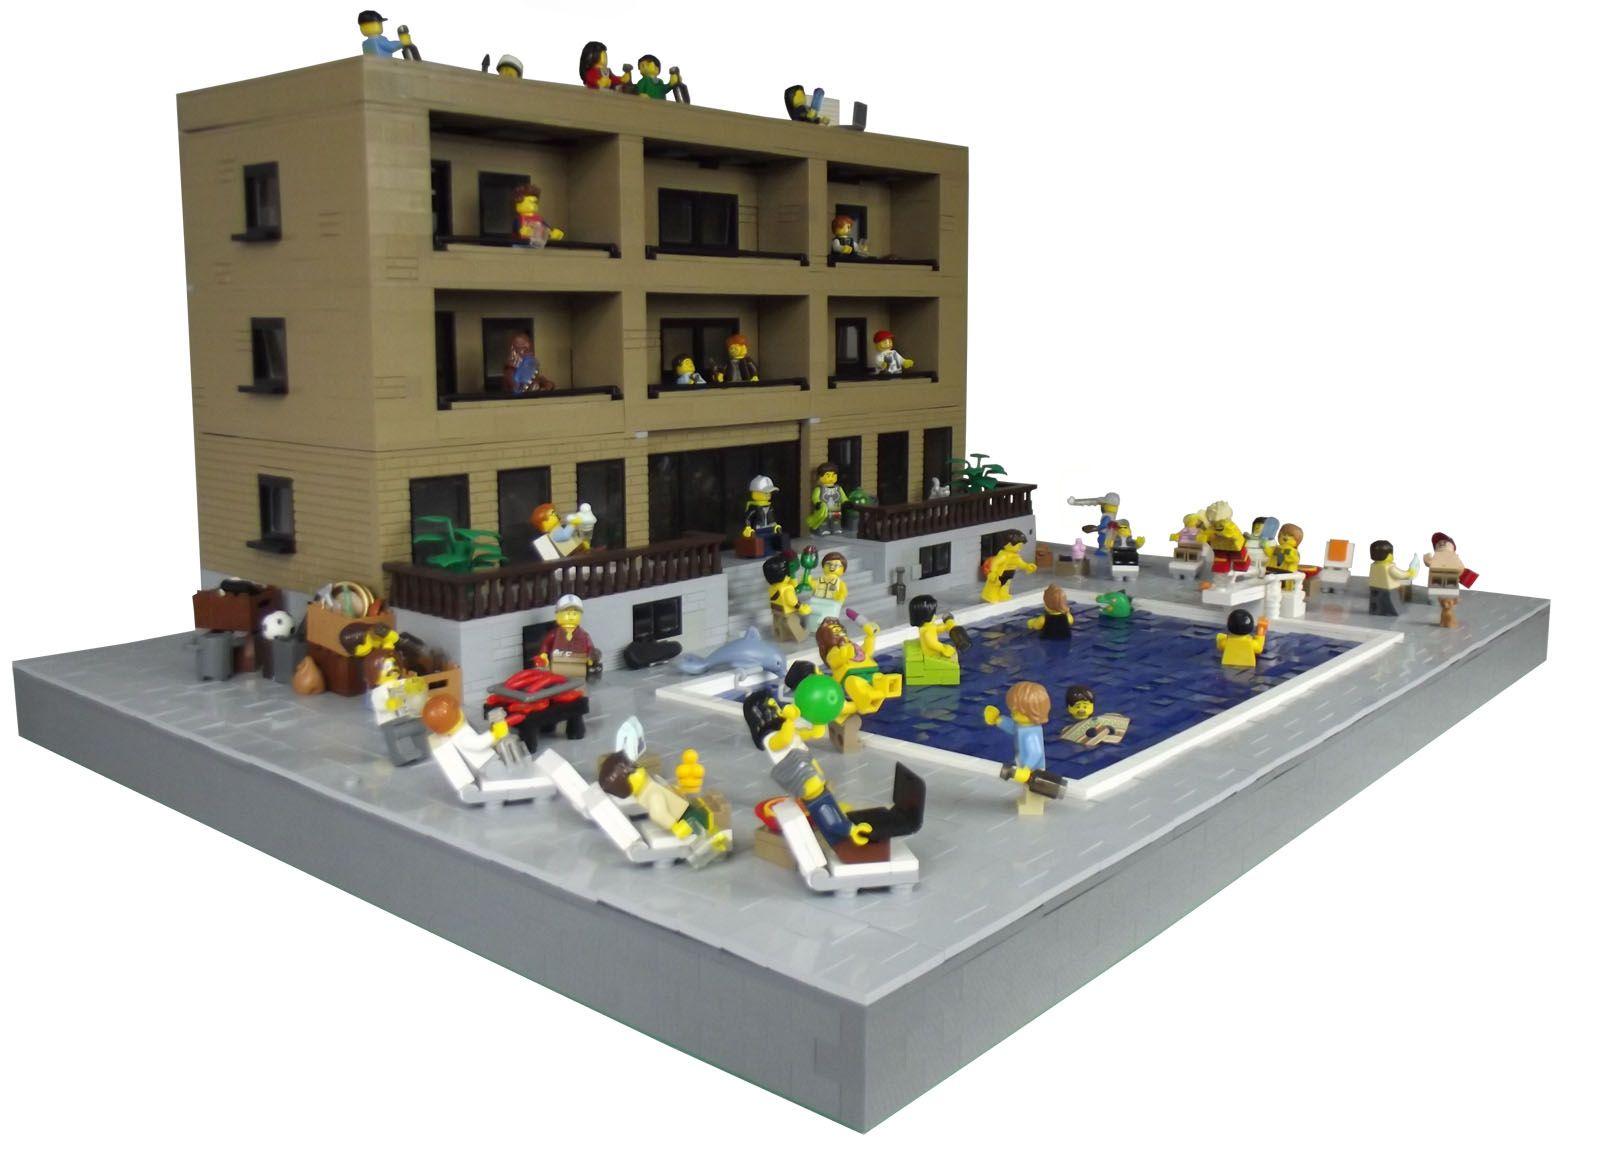 01 Cool Lego Creations Big Lego Sets Lego Furniture